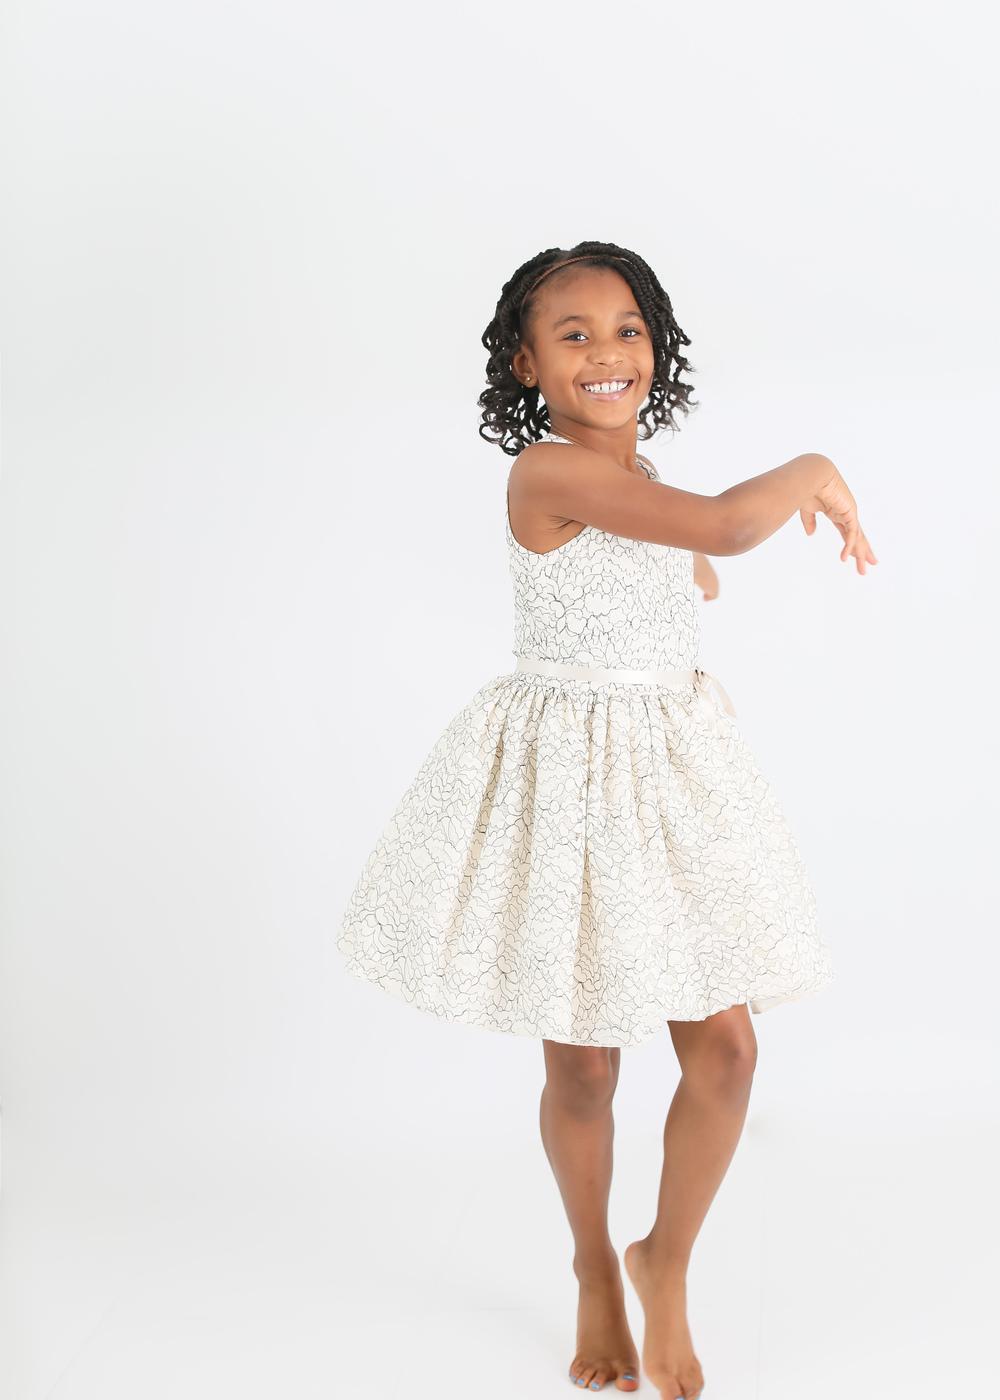 dancing-girl-twirl-skirt